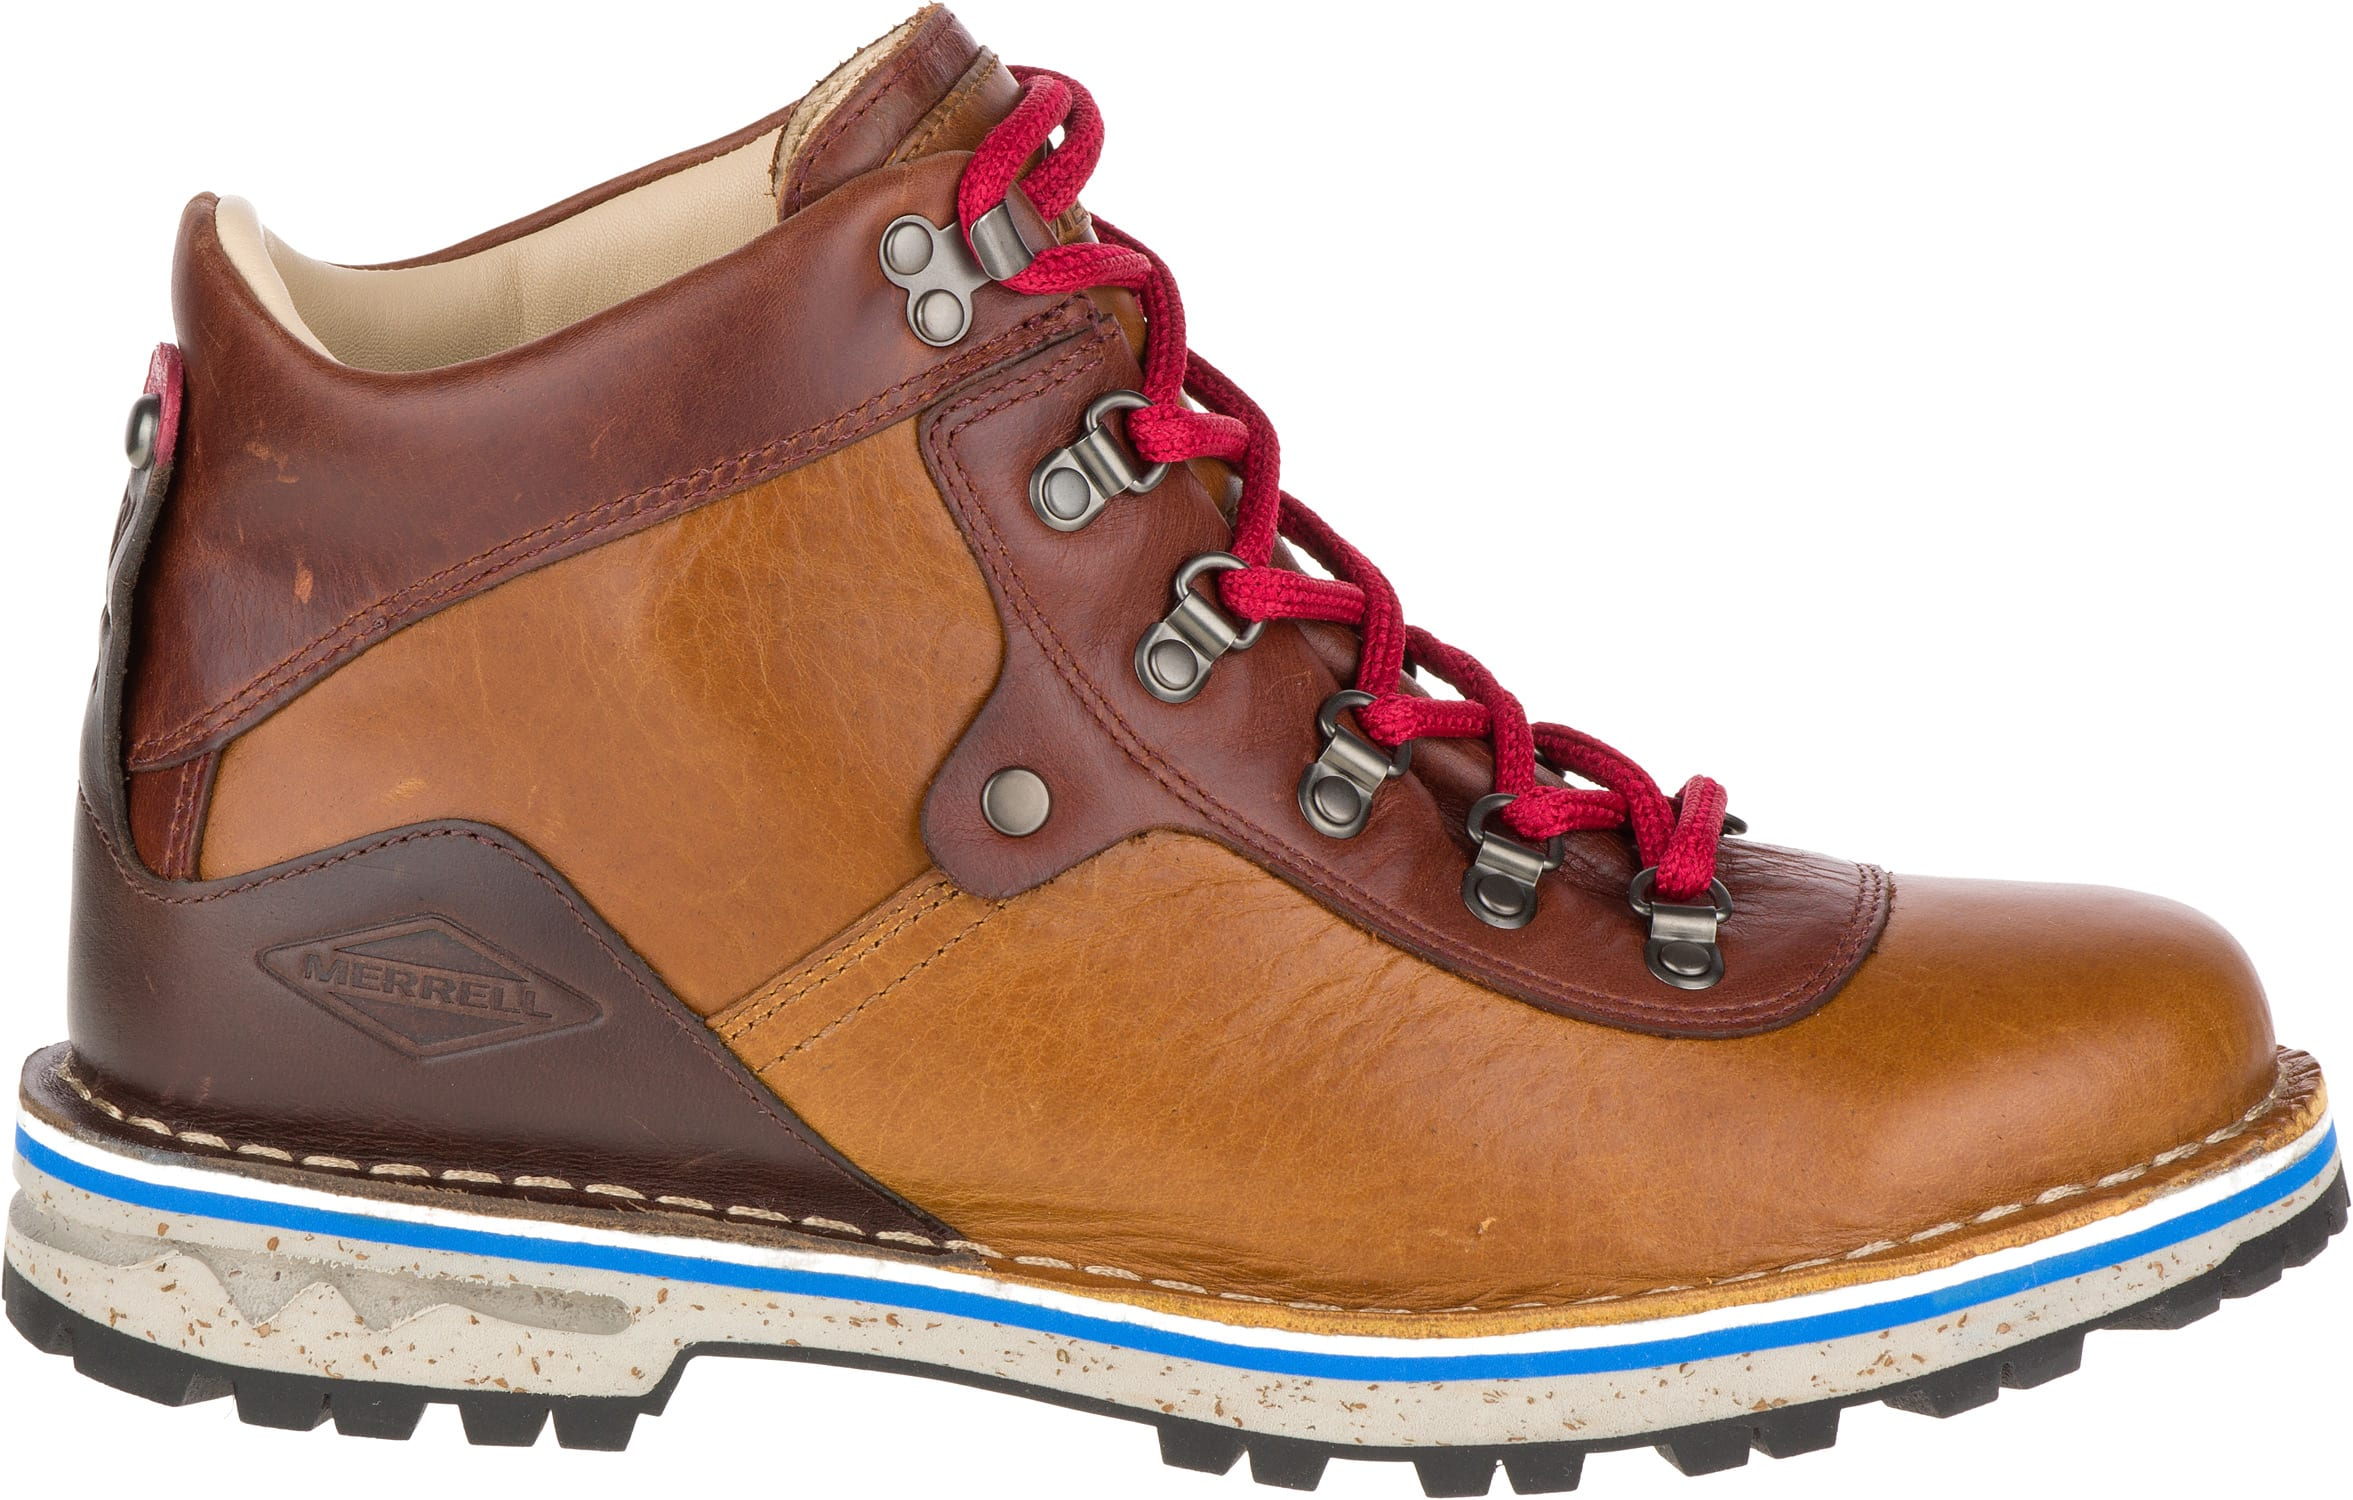 Merrell Sugarbush Waterproof Boots - Womens